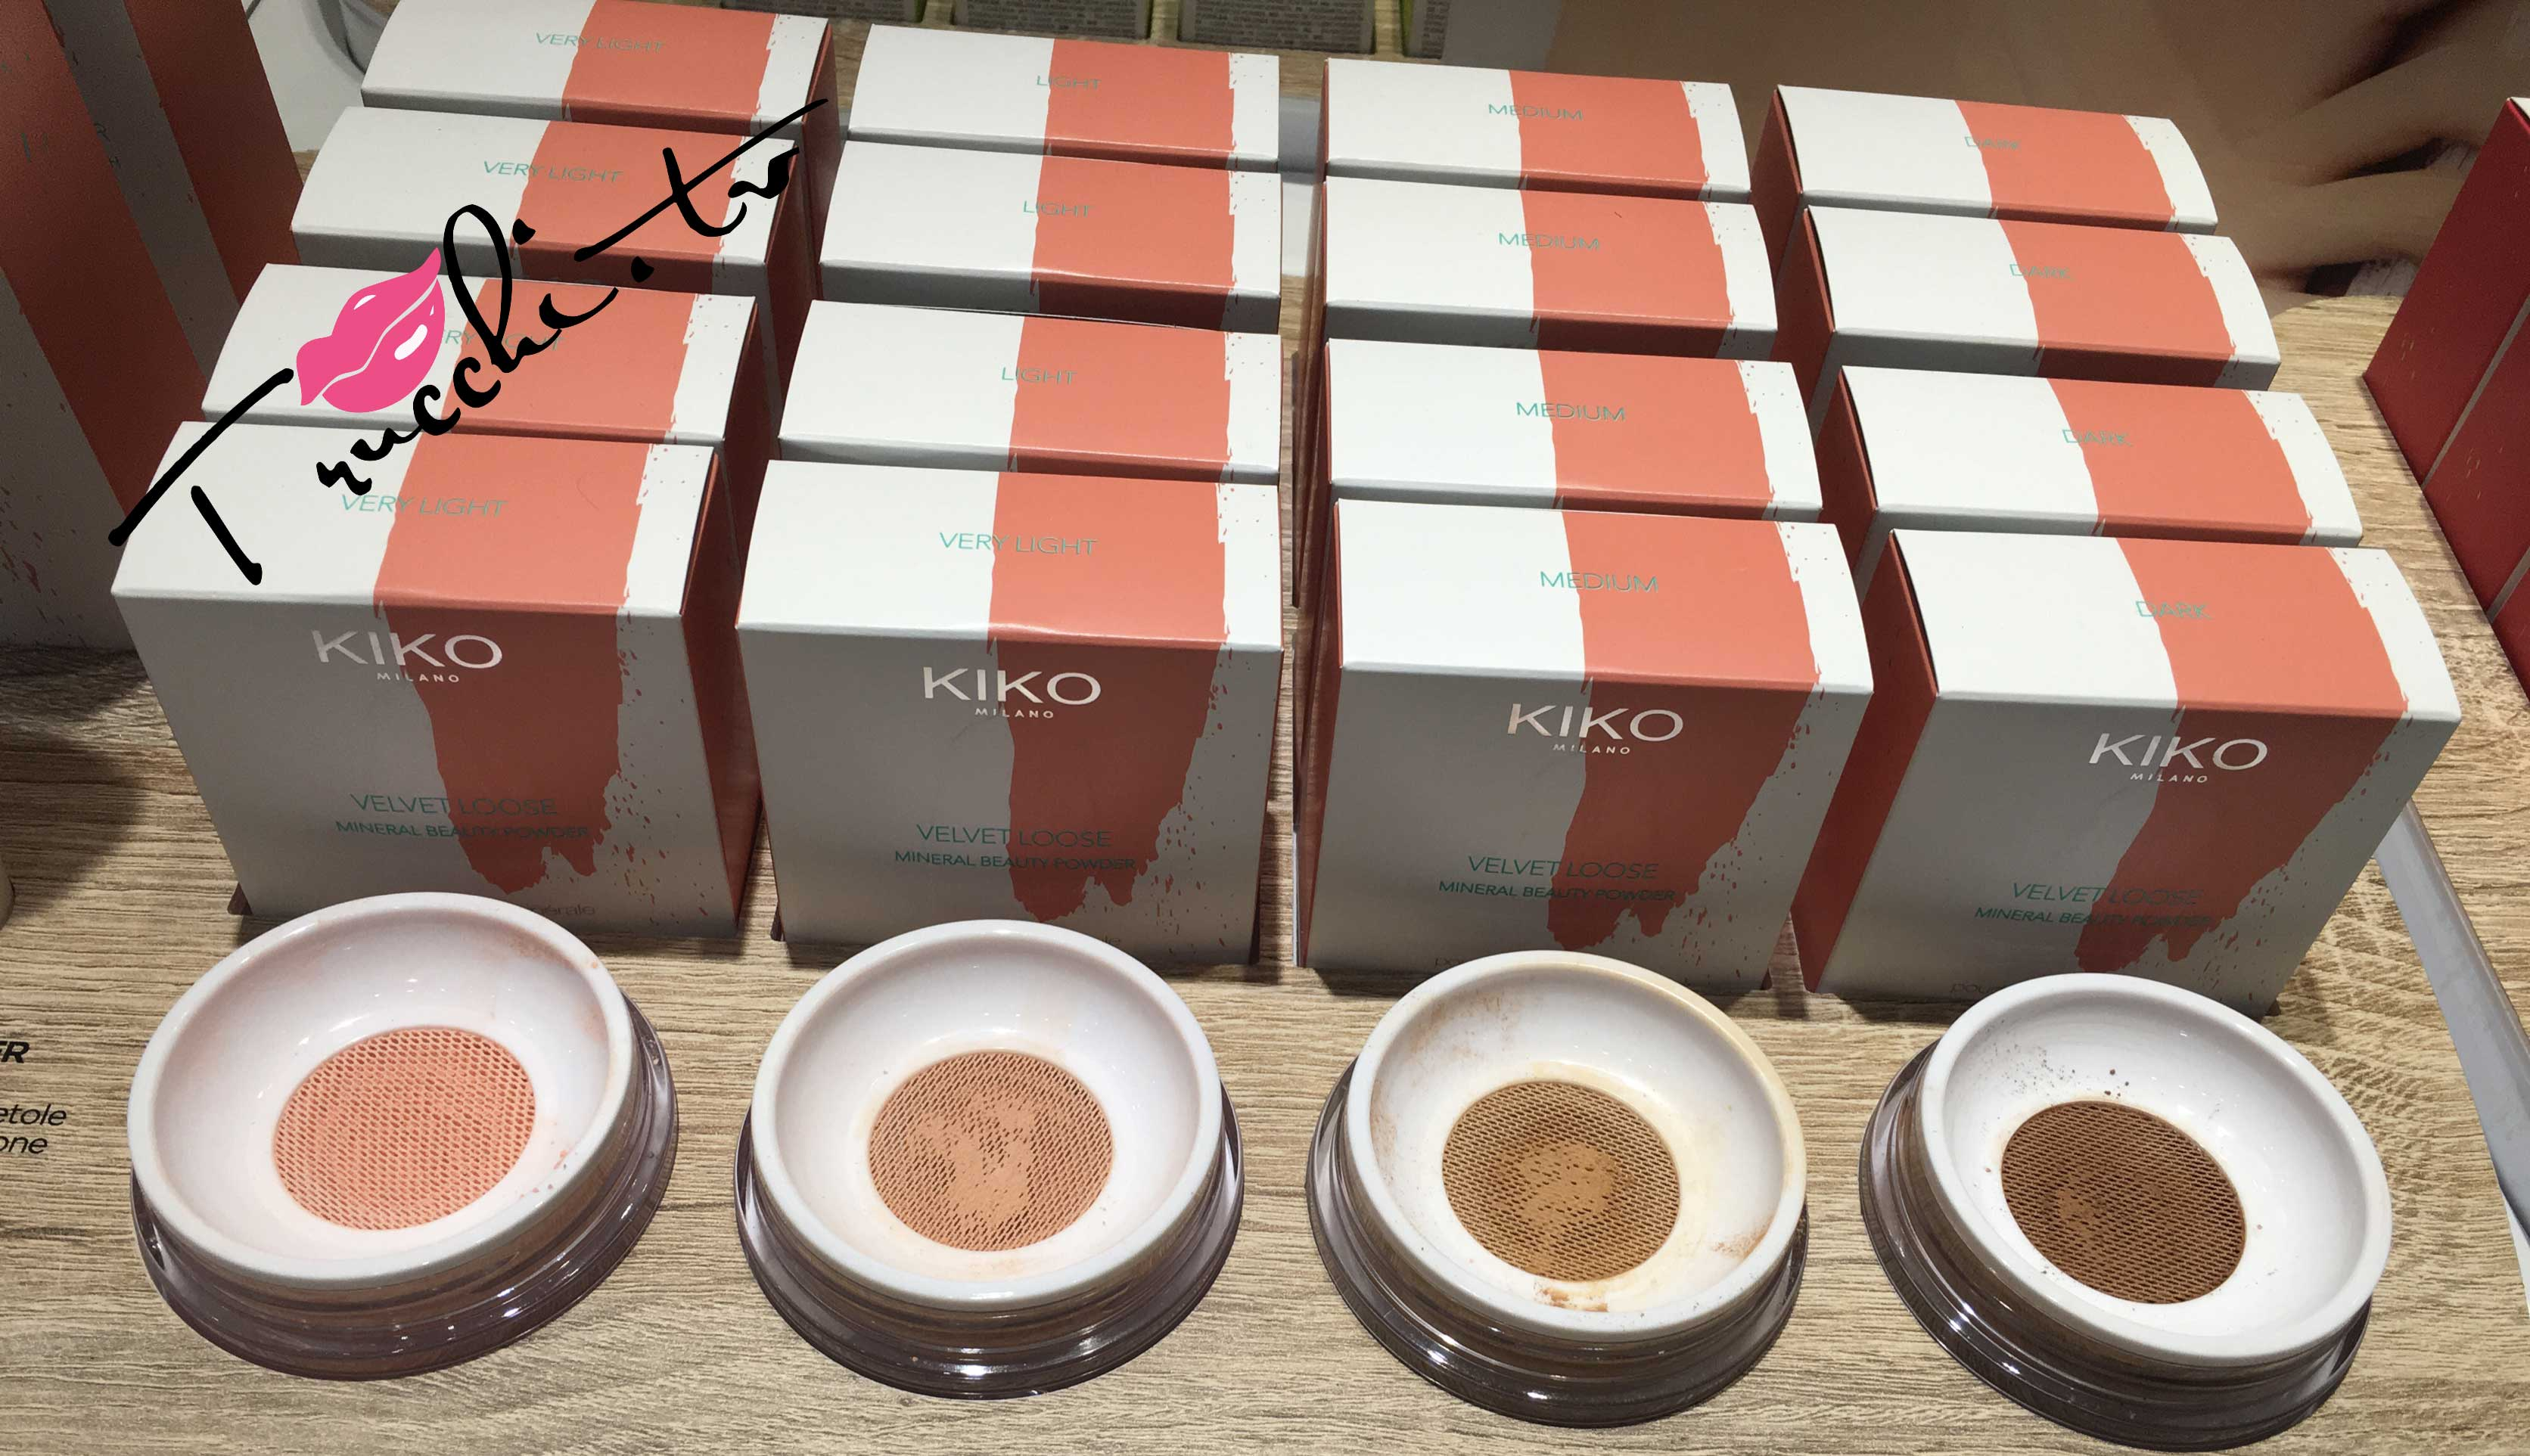 Kiko-The-Artist---Kiko-Velvet-Loose-Mineral-Beauty-Powder-